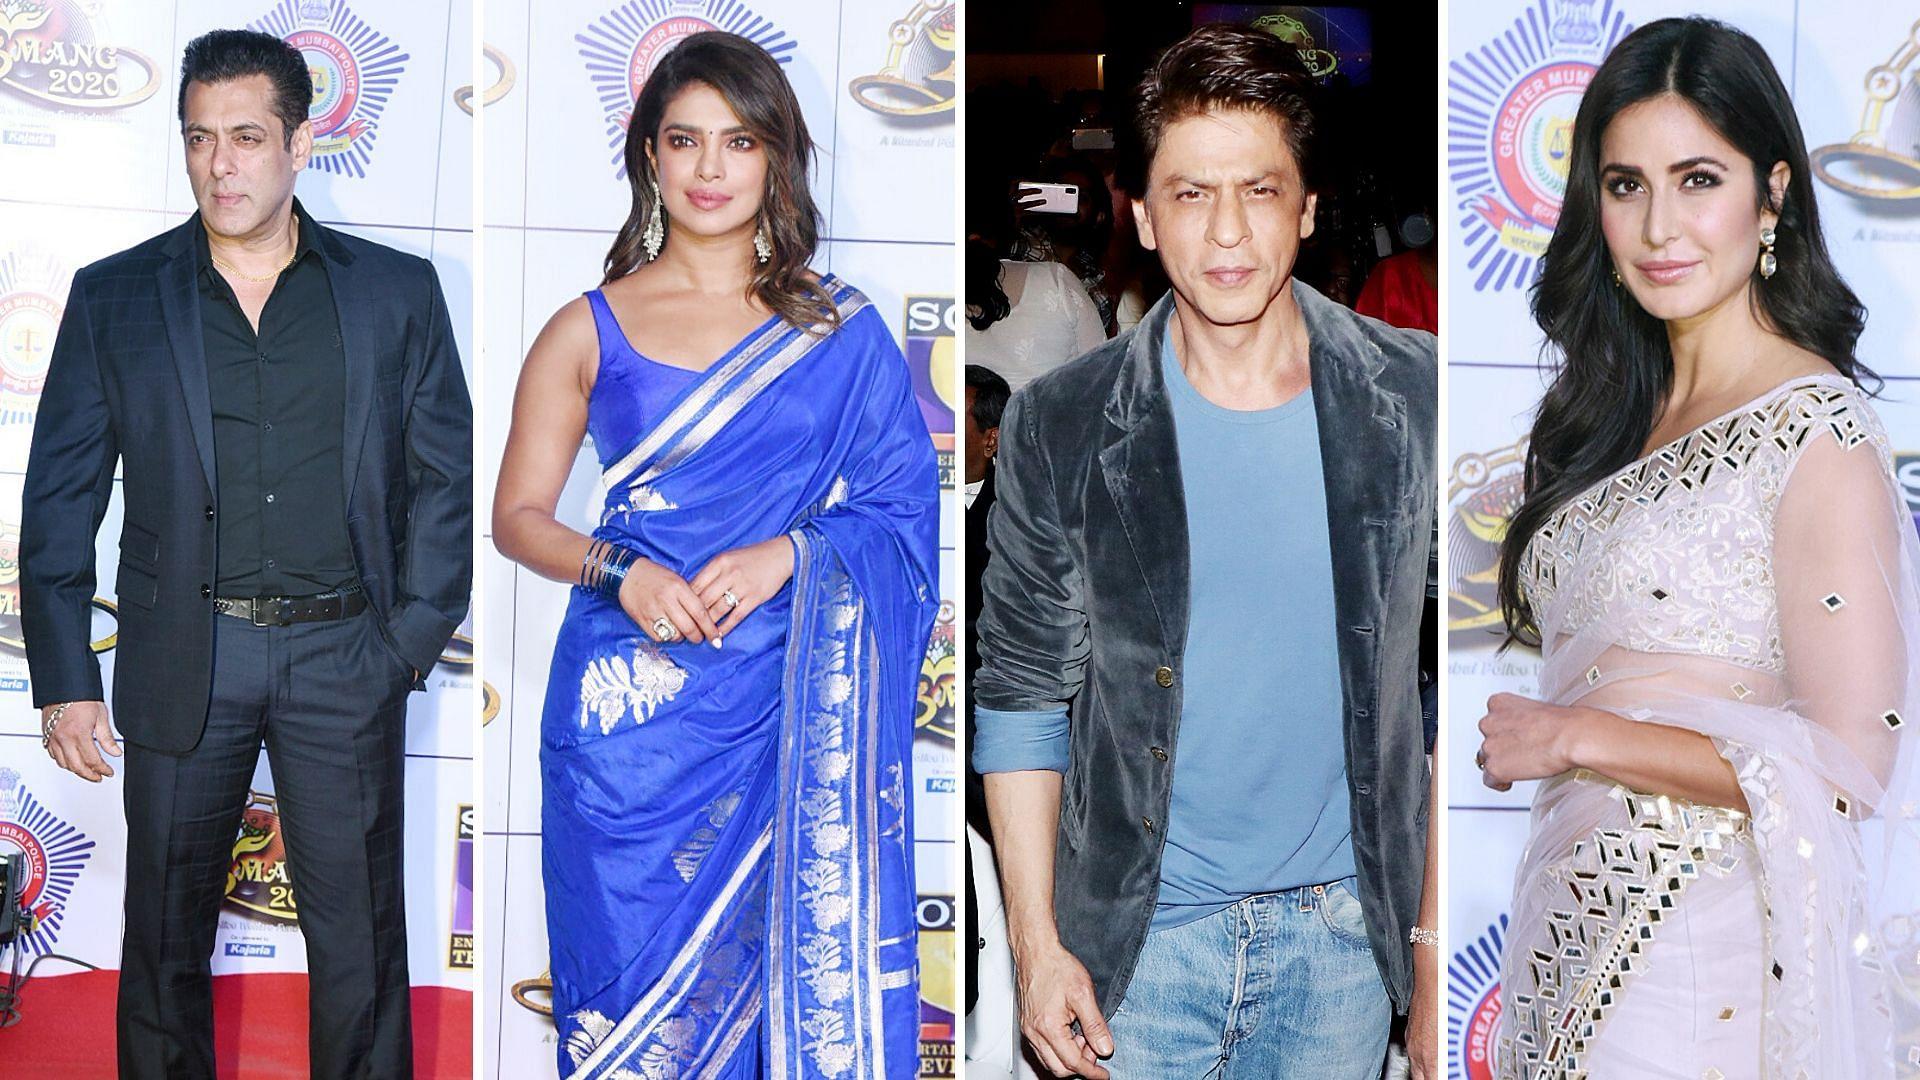 Pics: SRK, Salman, Priyanka, Varun Attend Umang 2020 Event